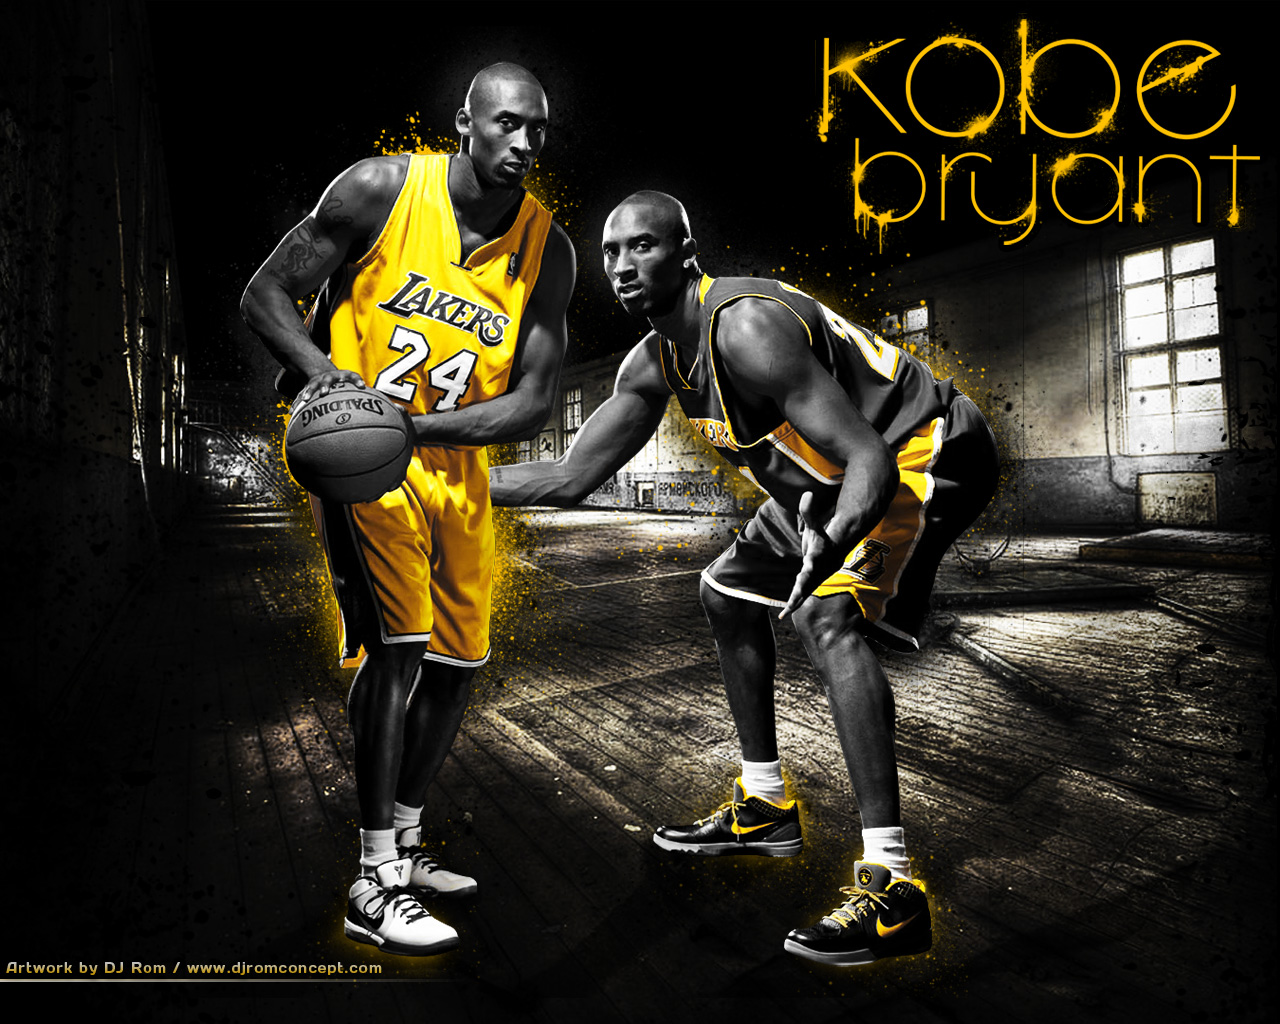 Wallpaper Kobe Bryant by djrom